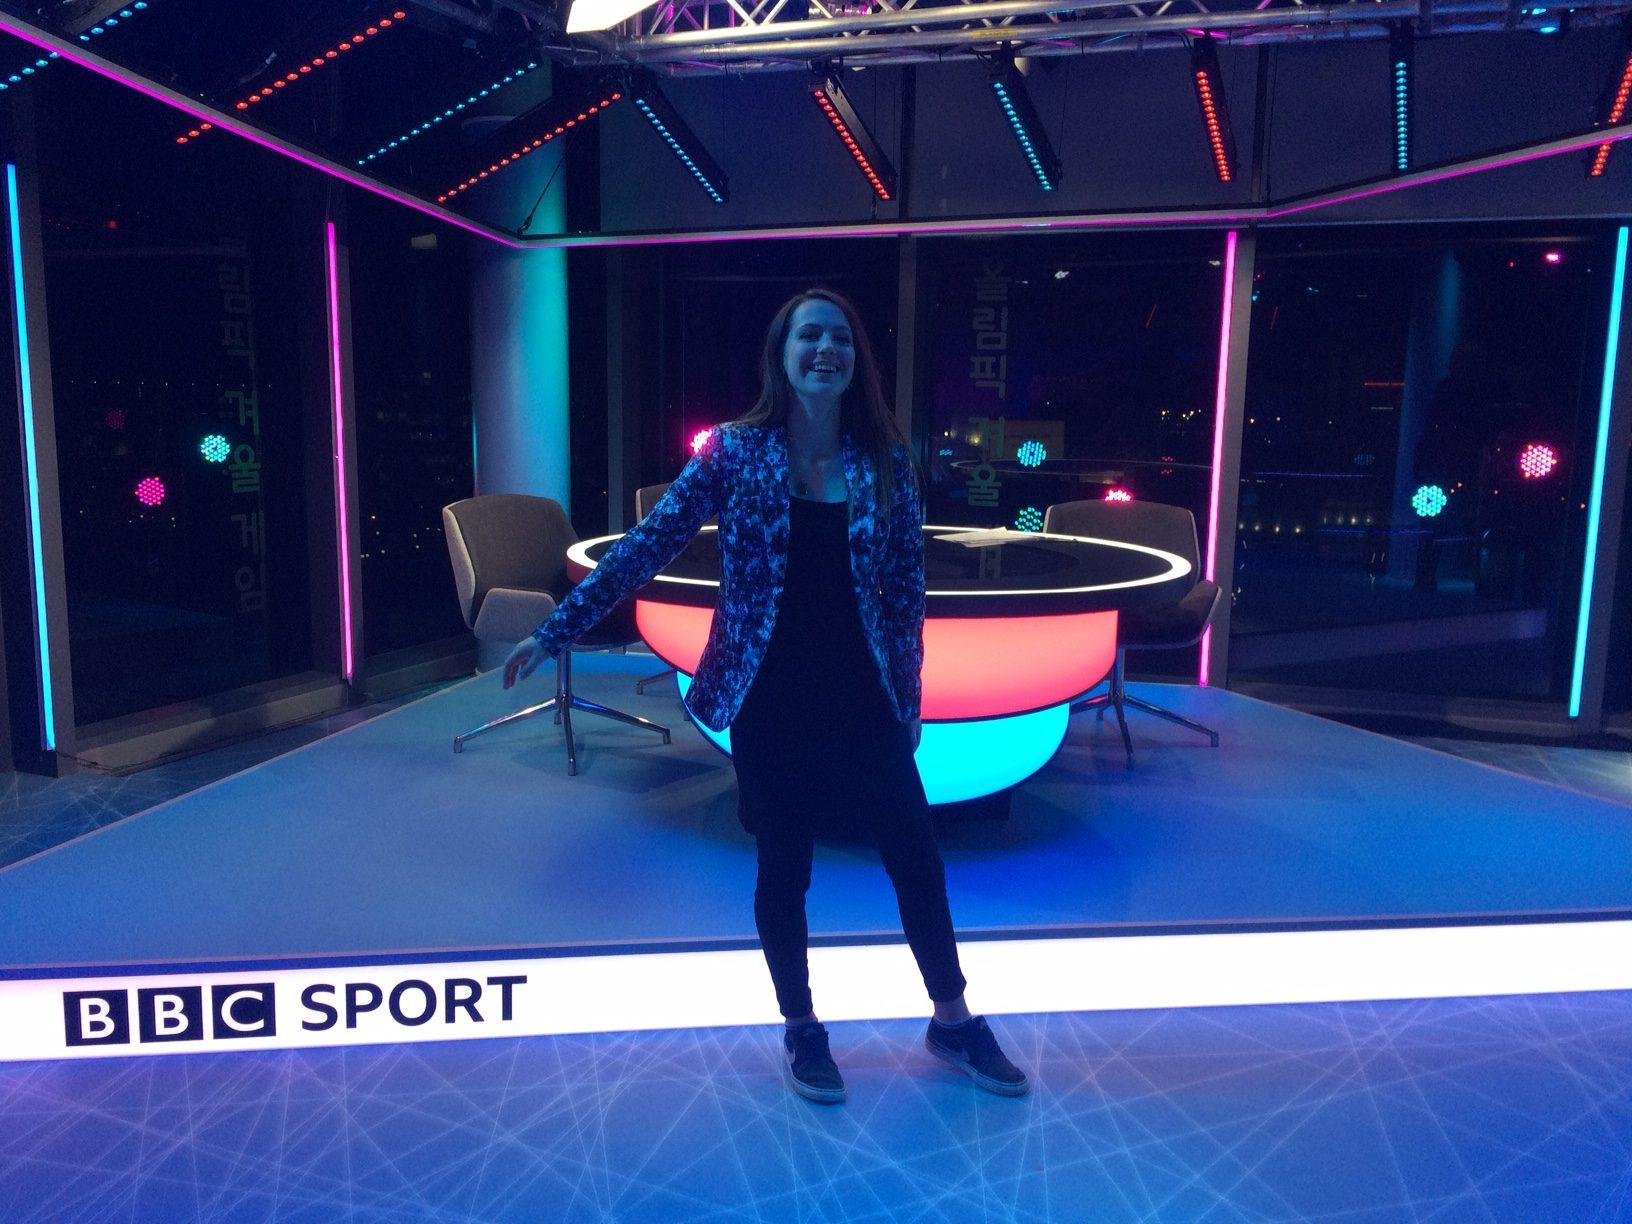 Pyeongchang olympic analysis on the BBC